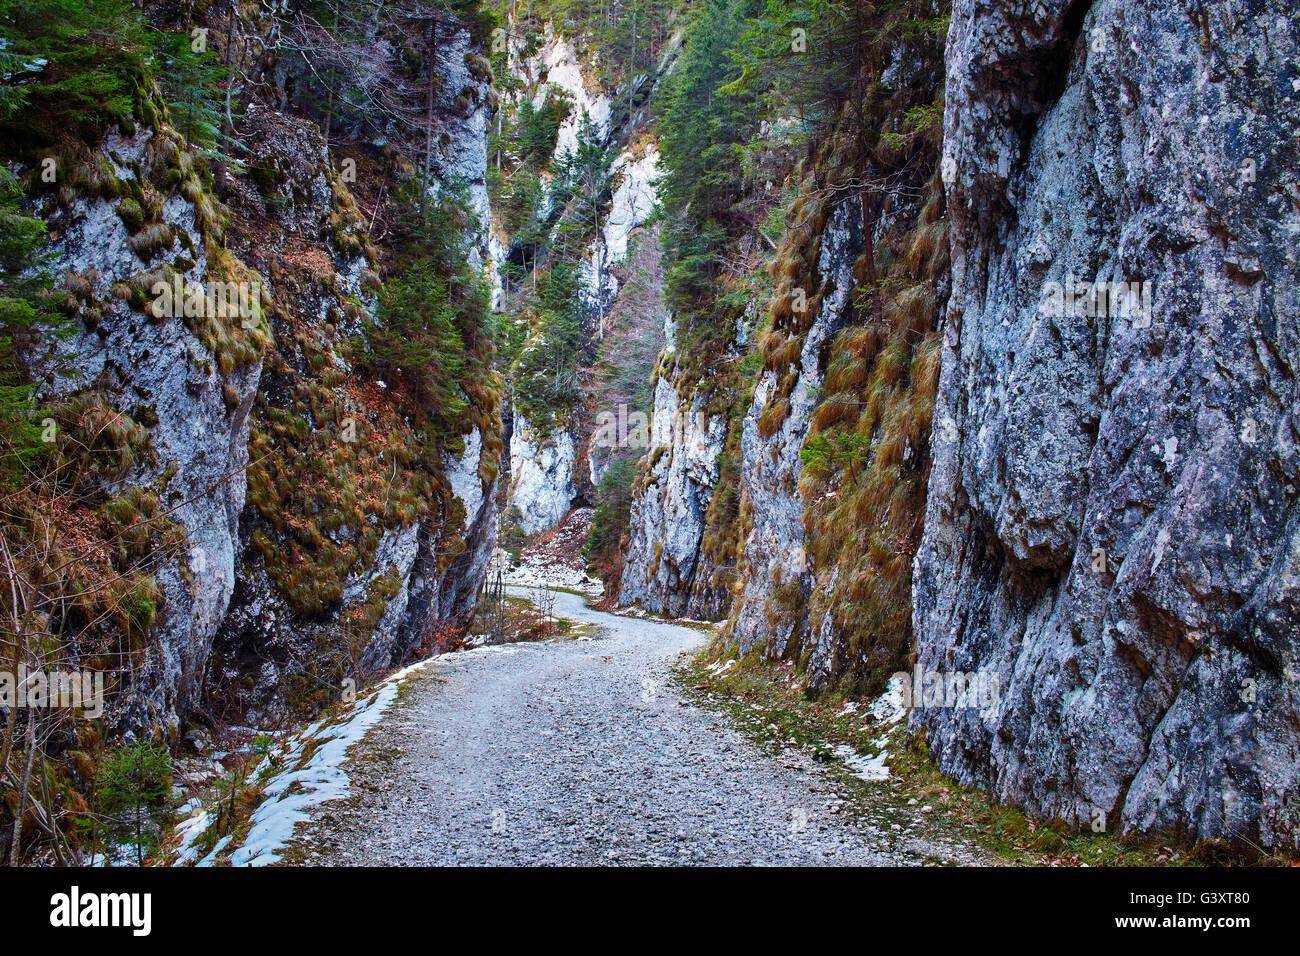 Dirt road going through a narrow canyon Stock Photo